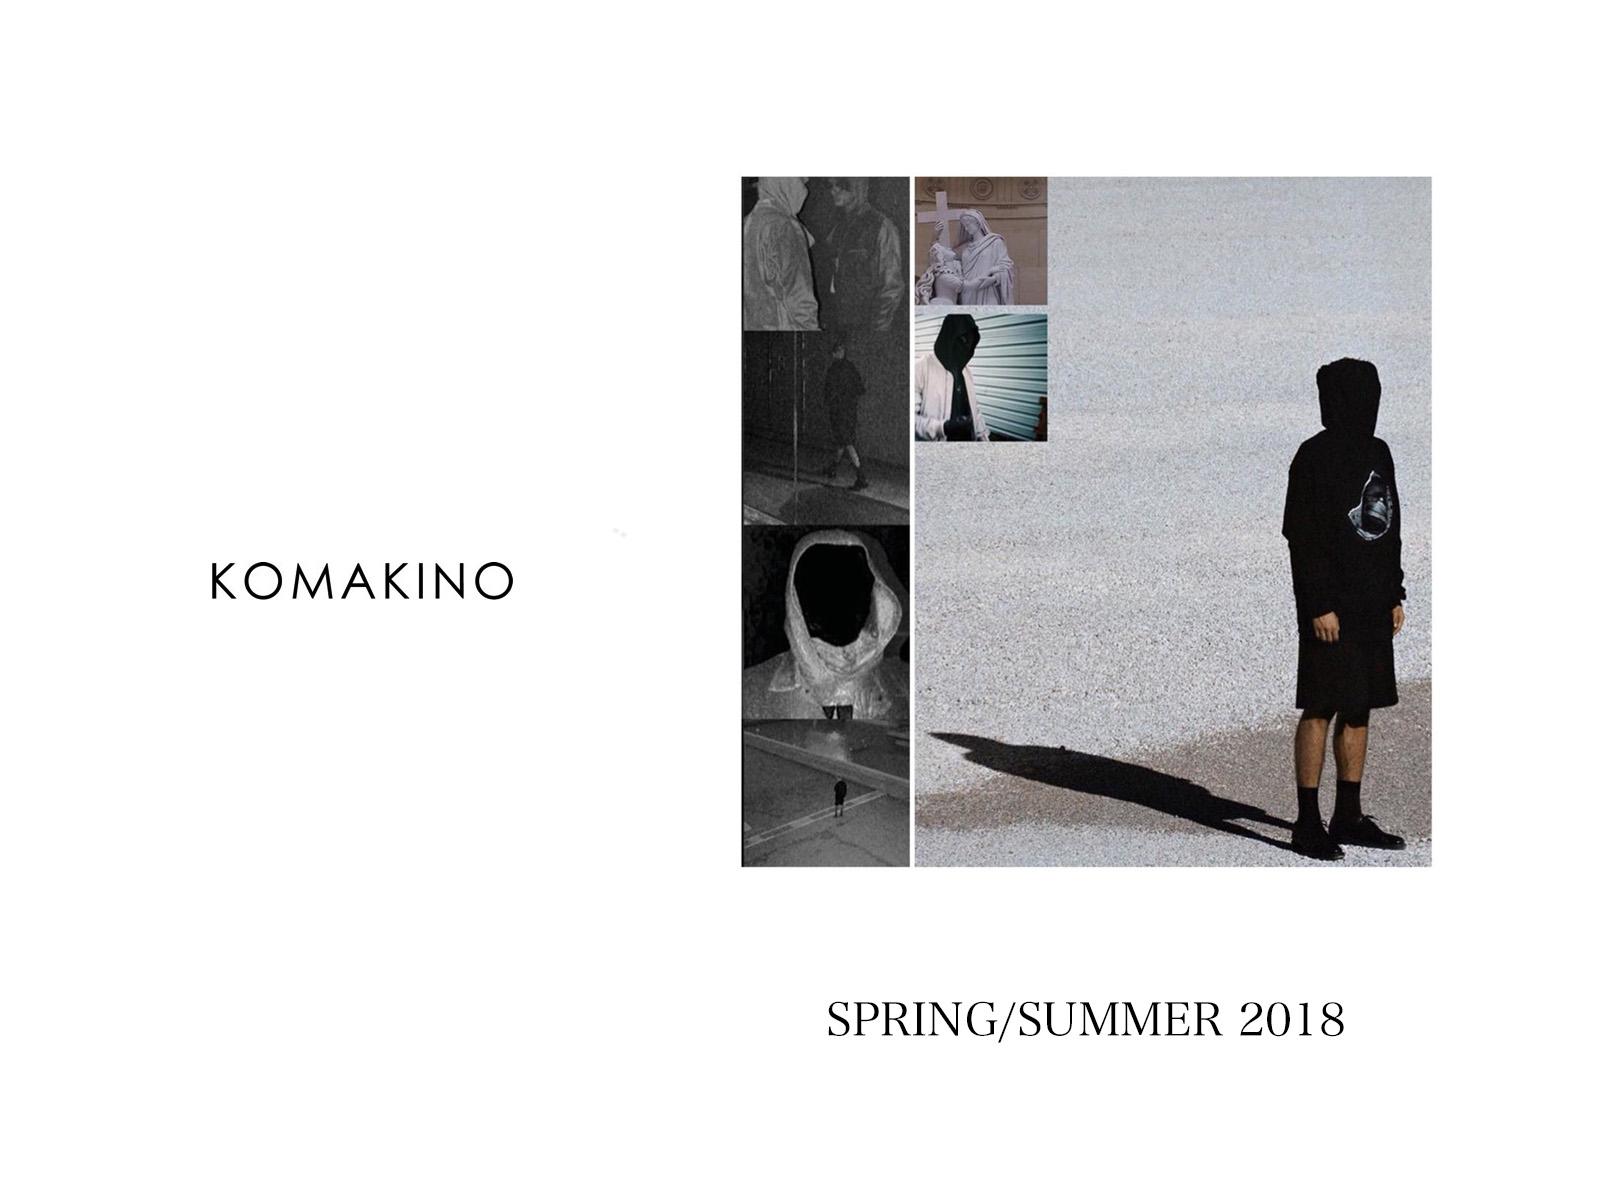 KOMAKINO SPRING/SUMMER 2018 入荷